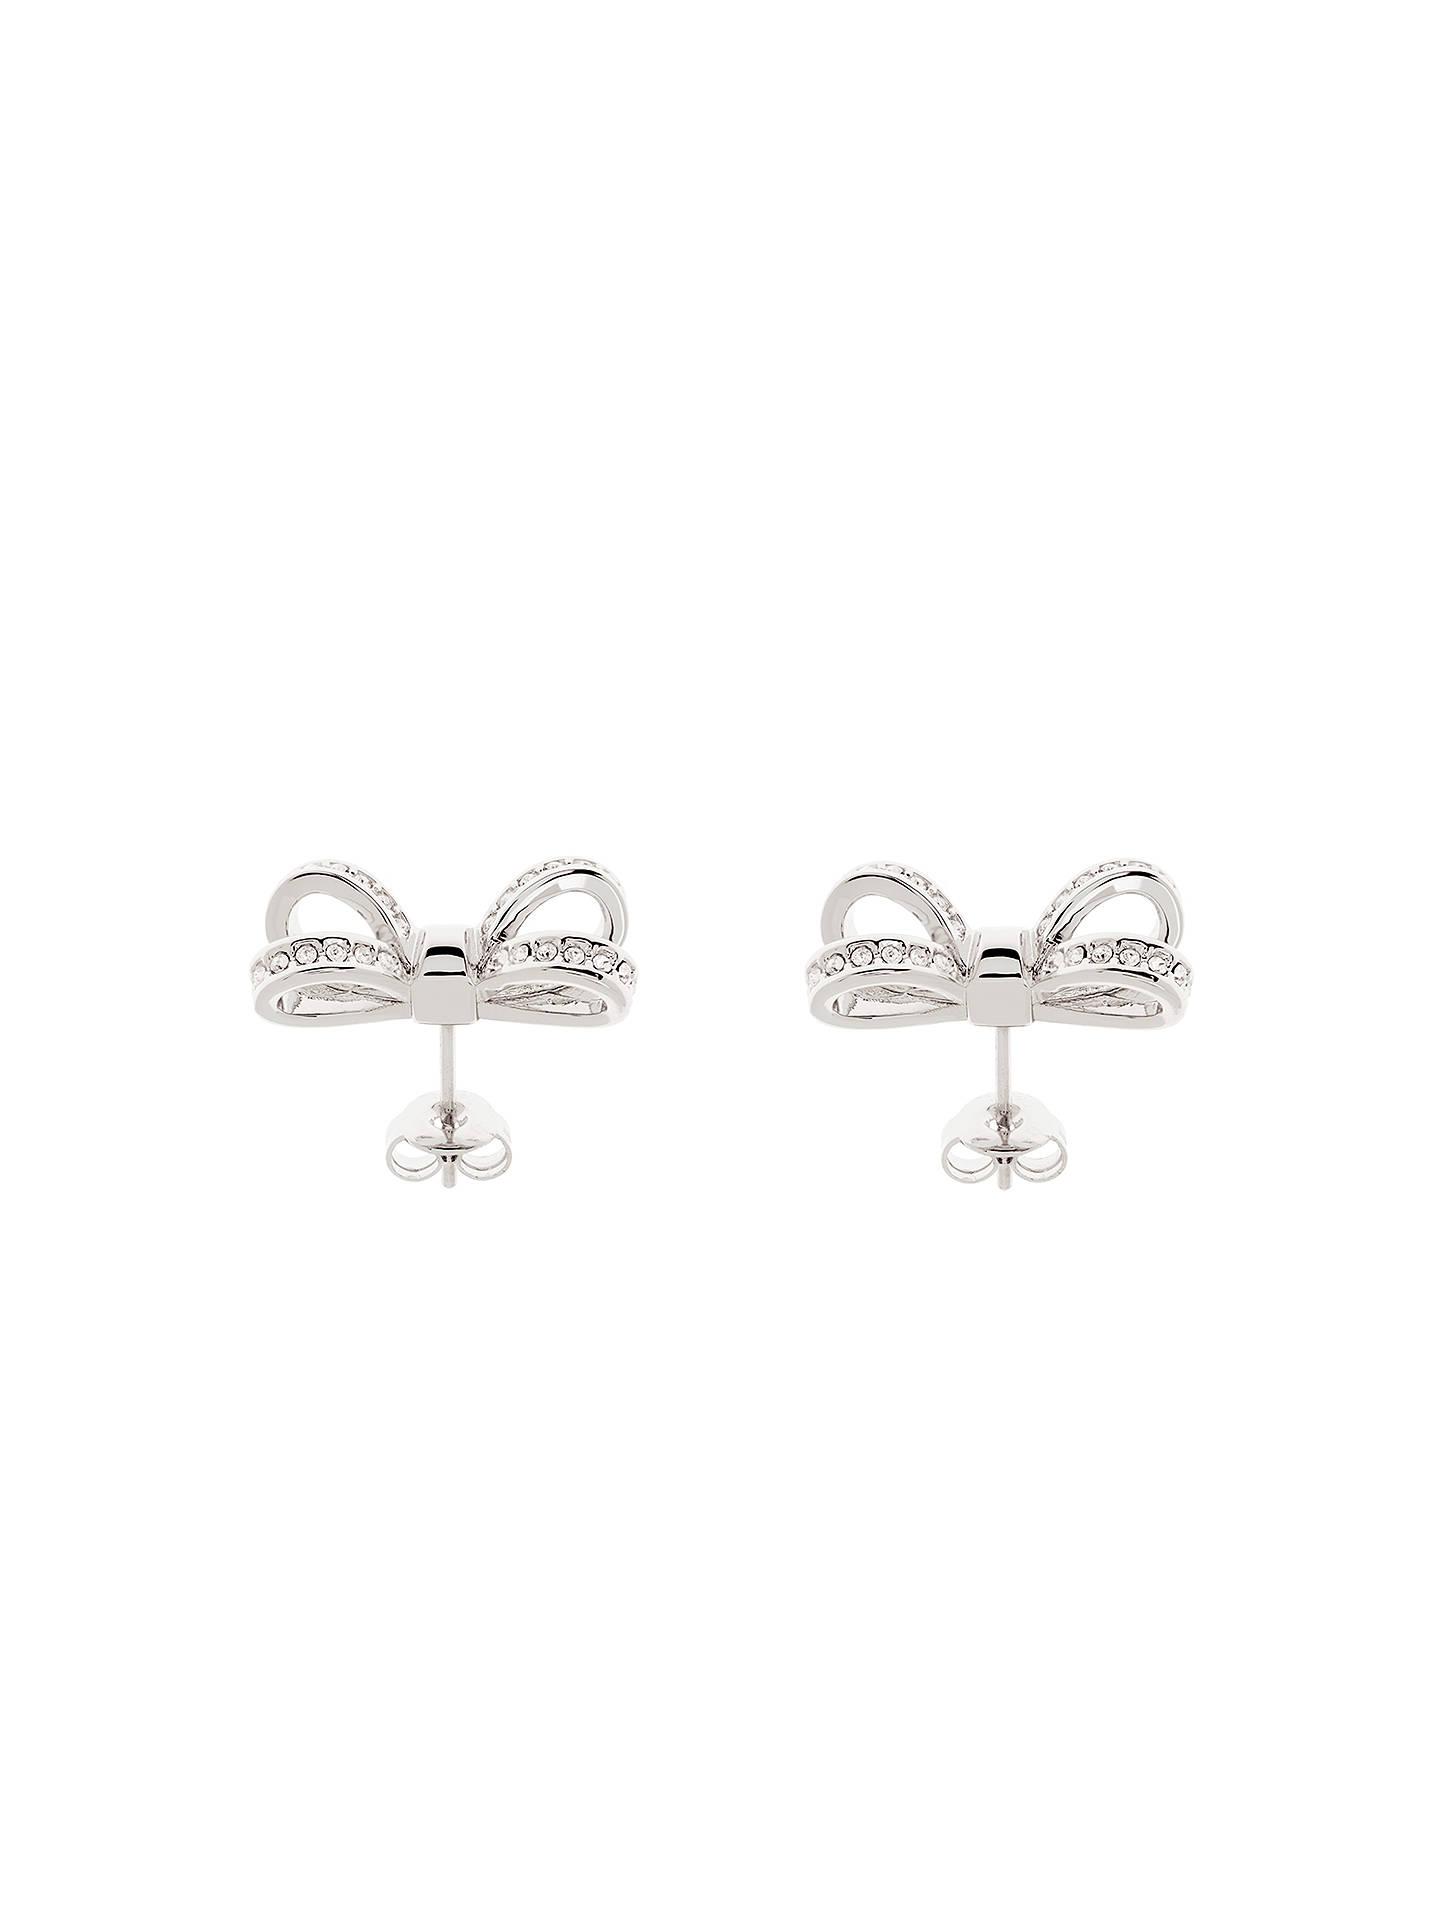 e09c5b418550 ... Buy Ted Baker Olitta Mini Pave Swarovski Crystal Bow Stud Earrings